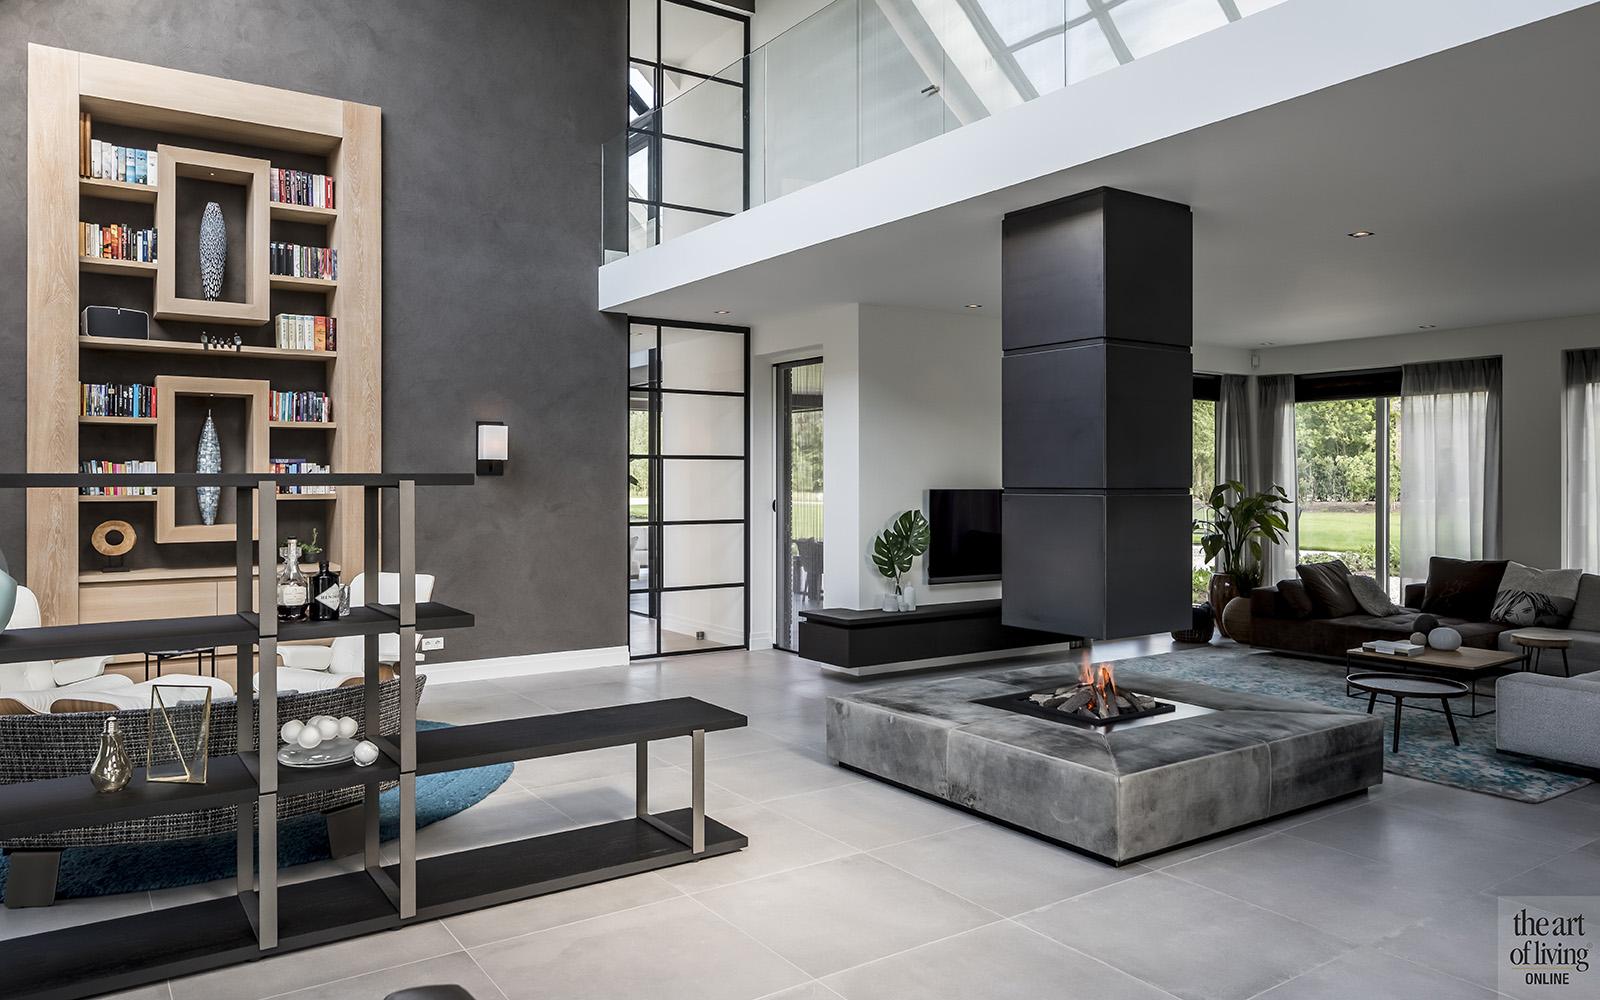 Design interieur | Versteegh Design | The Art of Living (NL)